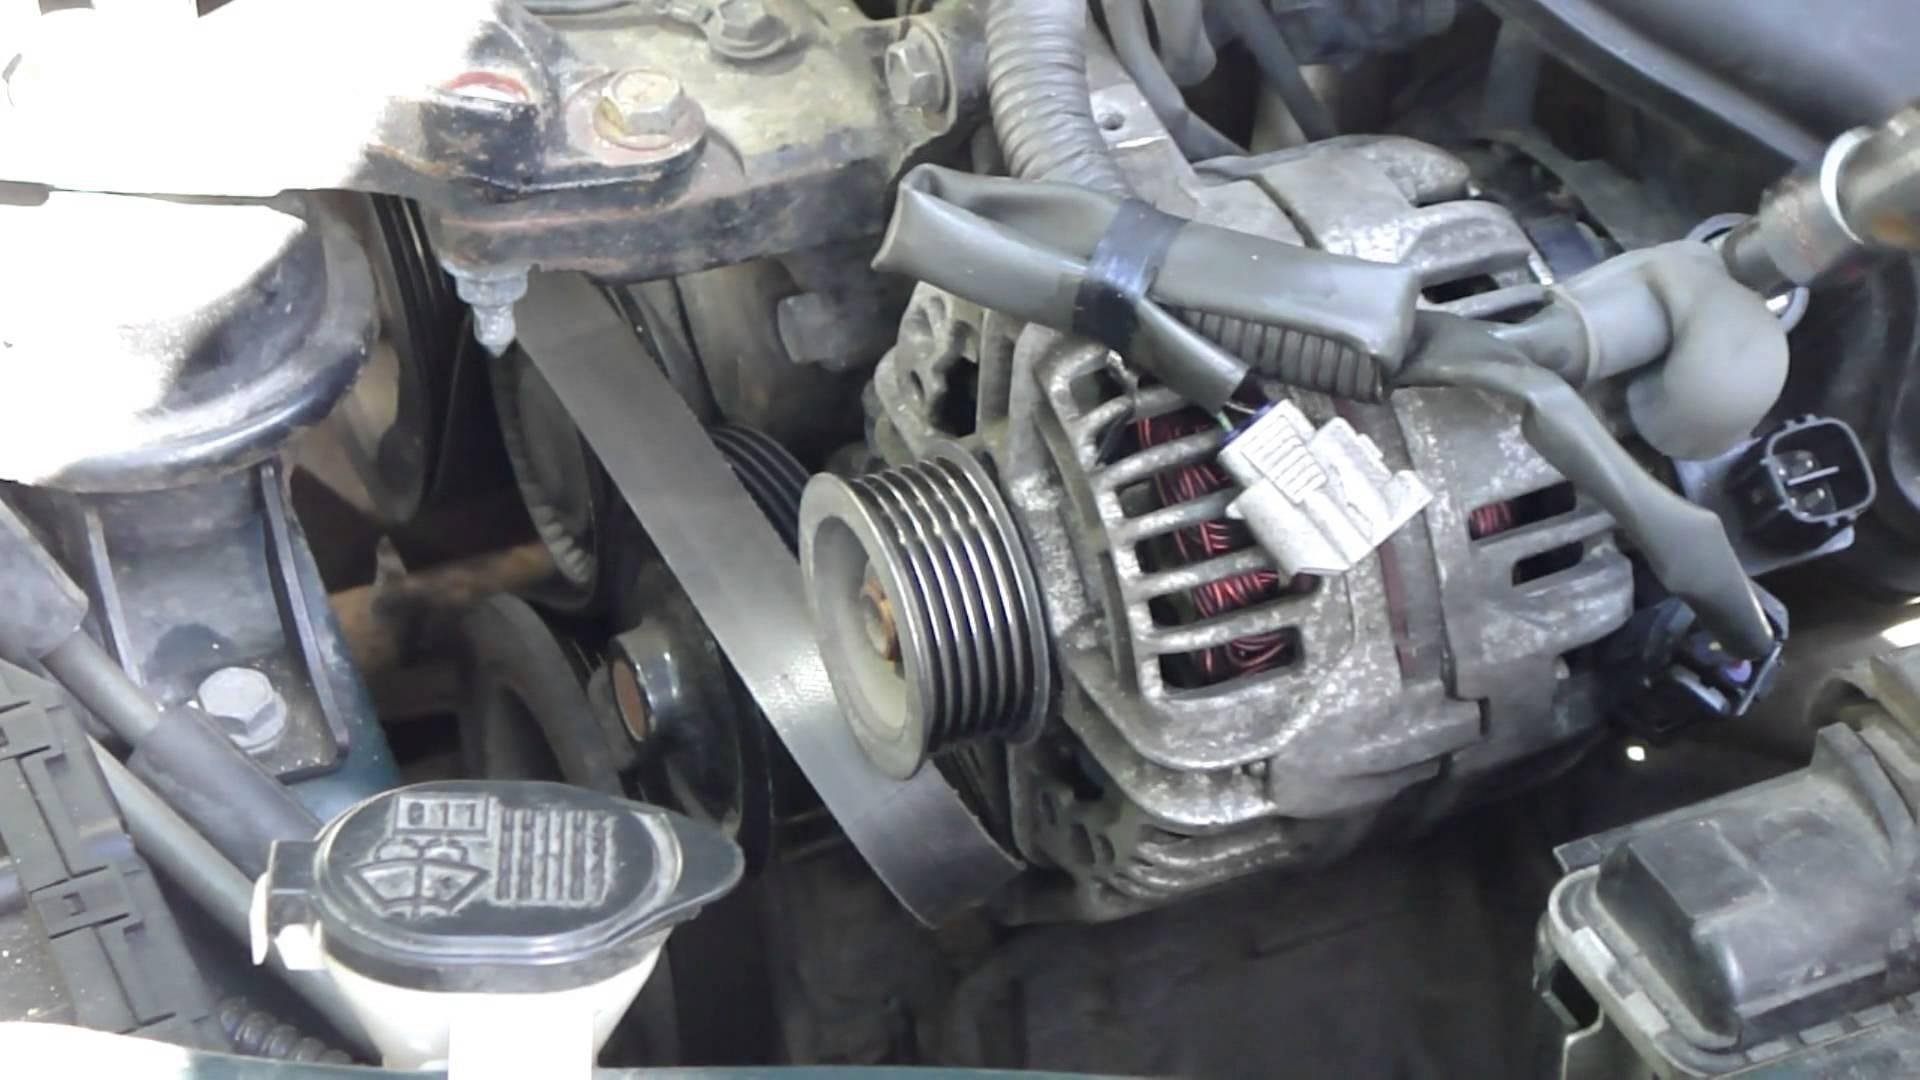 hight resolution of 2011 toyota camry engine diagram how to change alternator toyota corolla vvt i engine years 2000